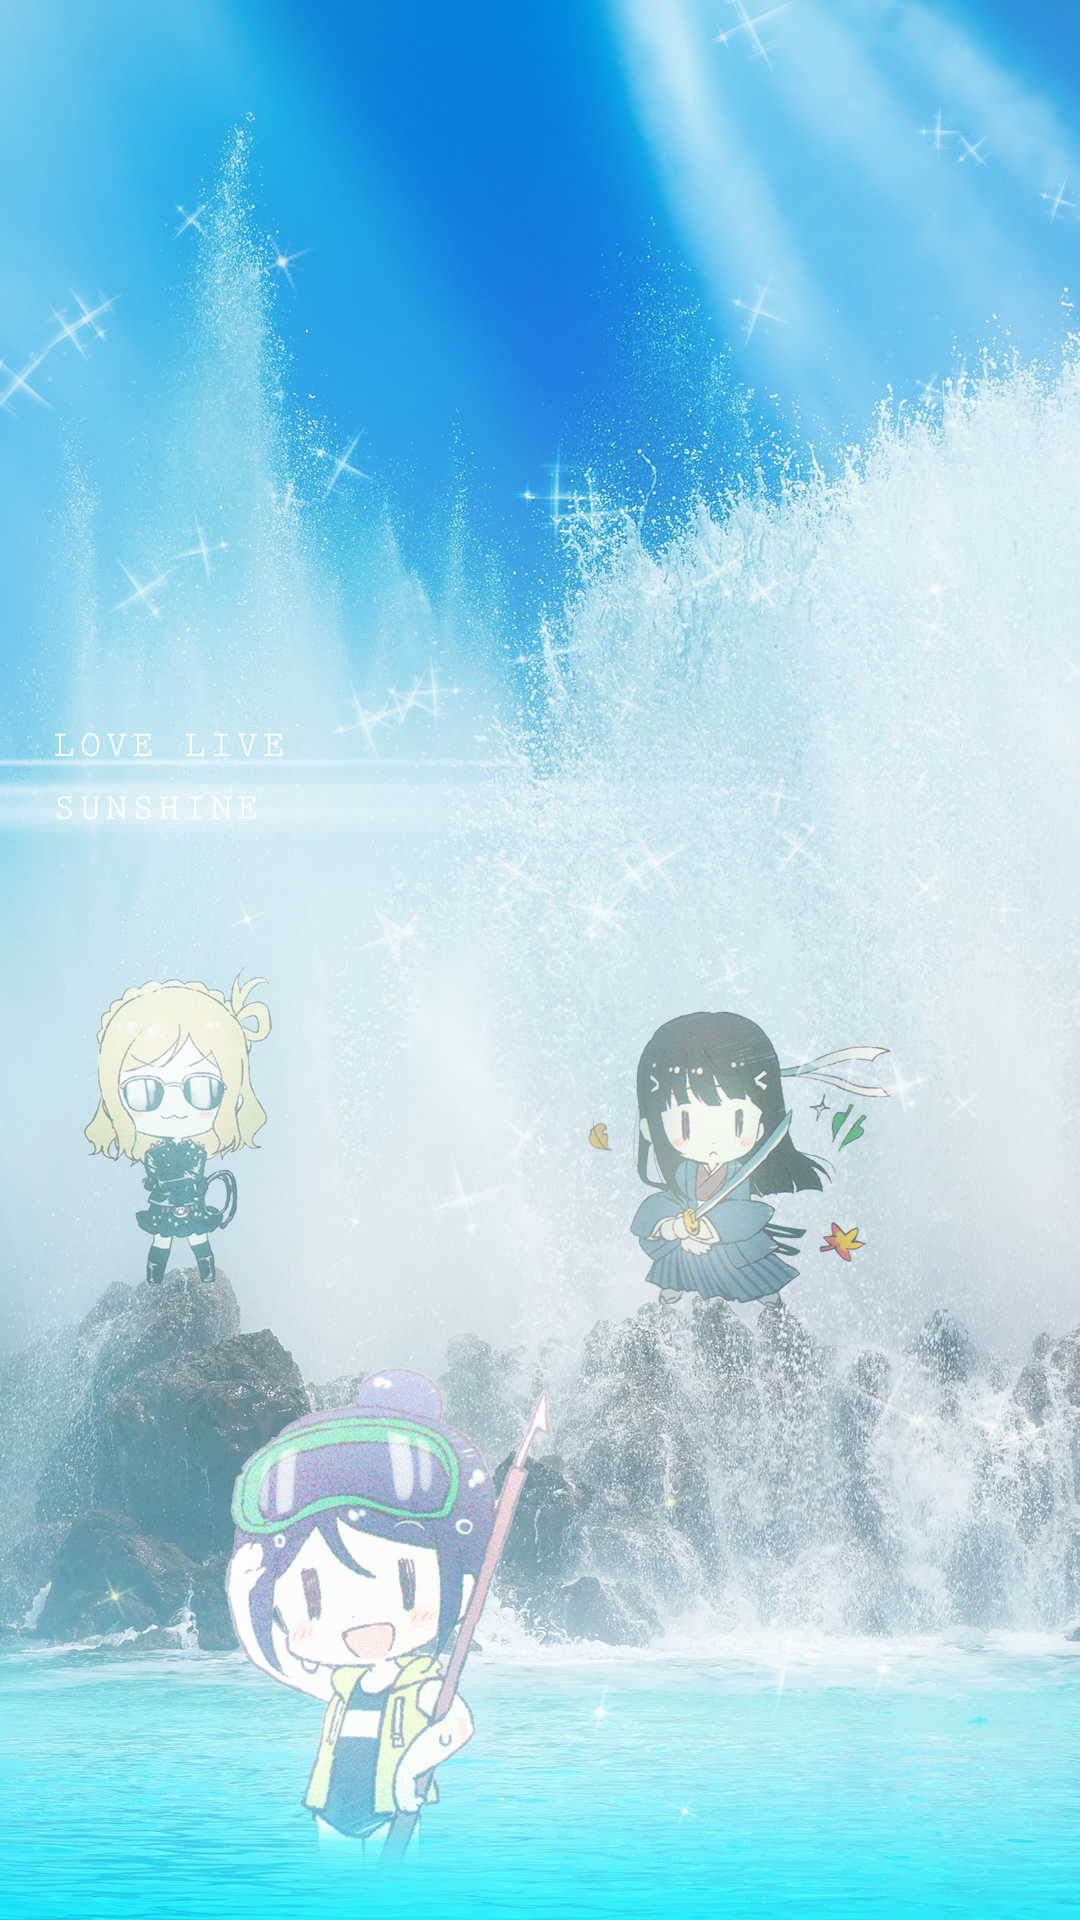 Anime Love Live Sunshine 1080x1920 Wallpaper Id 750306